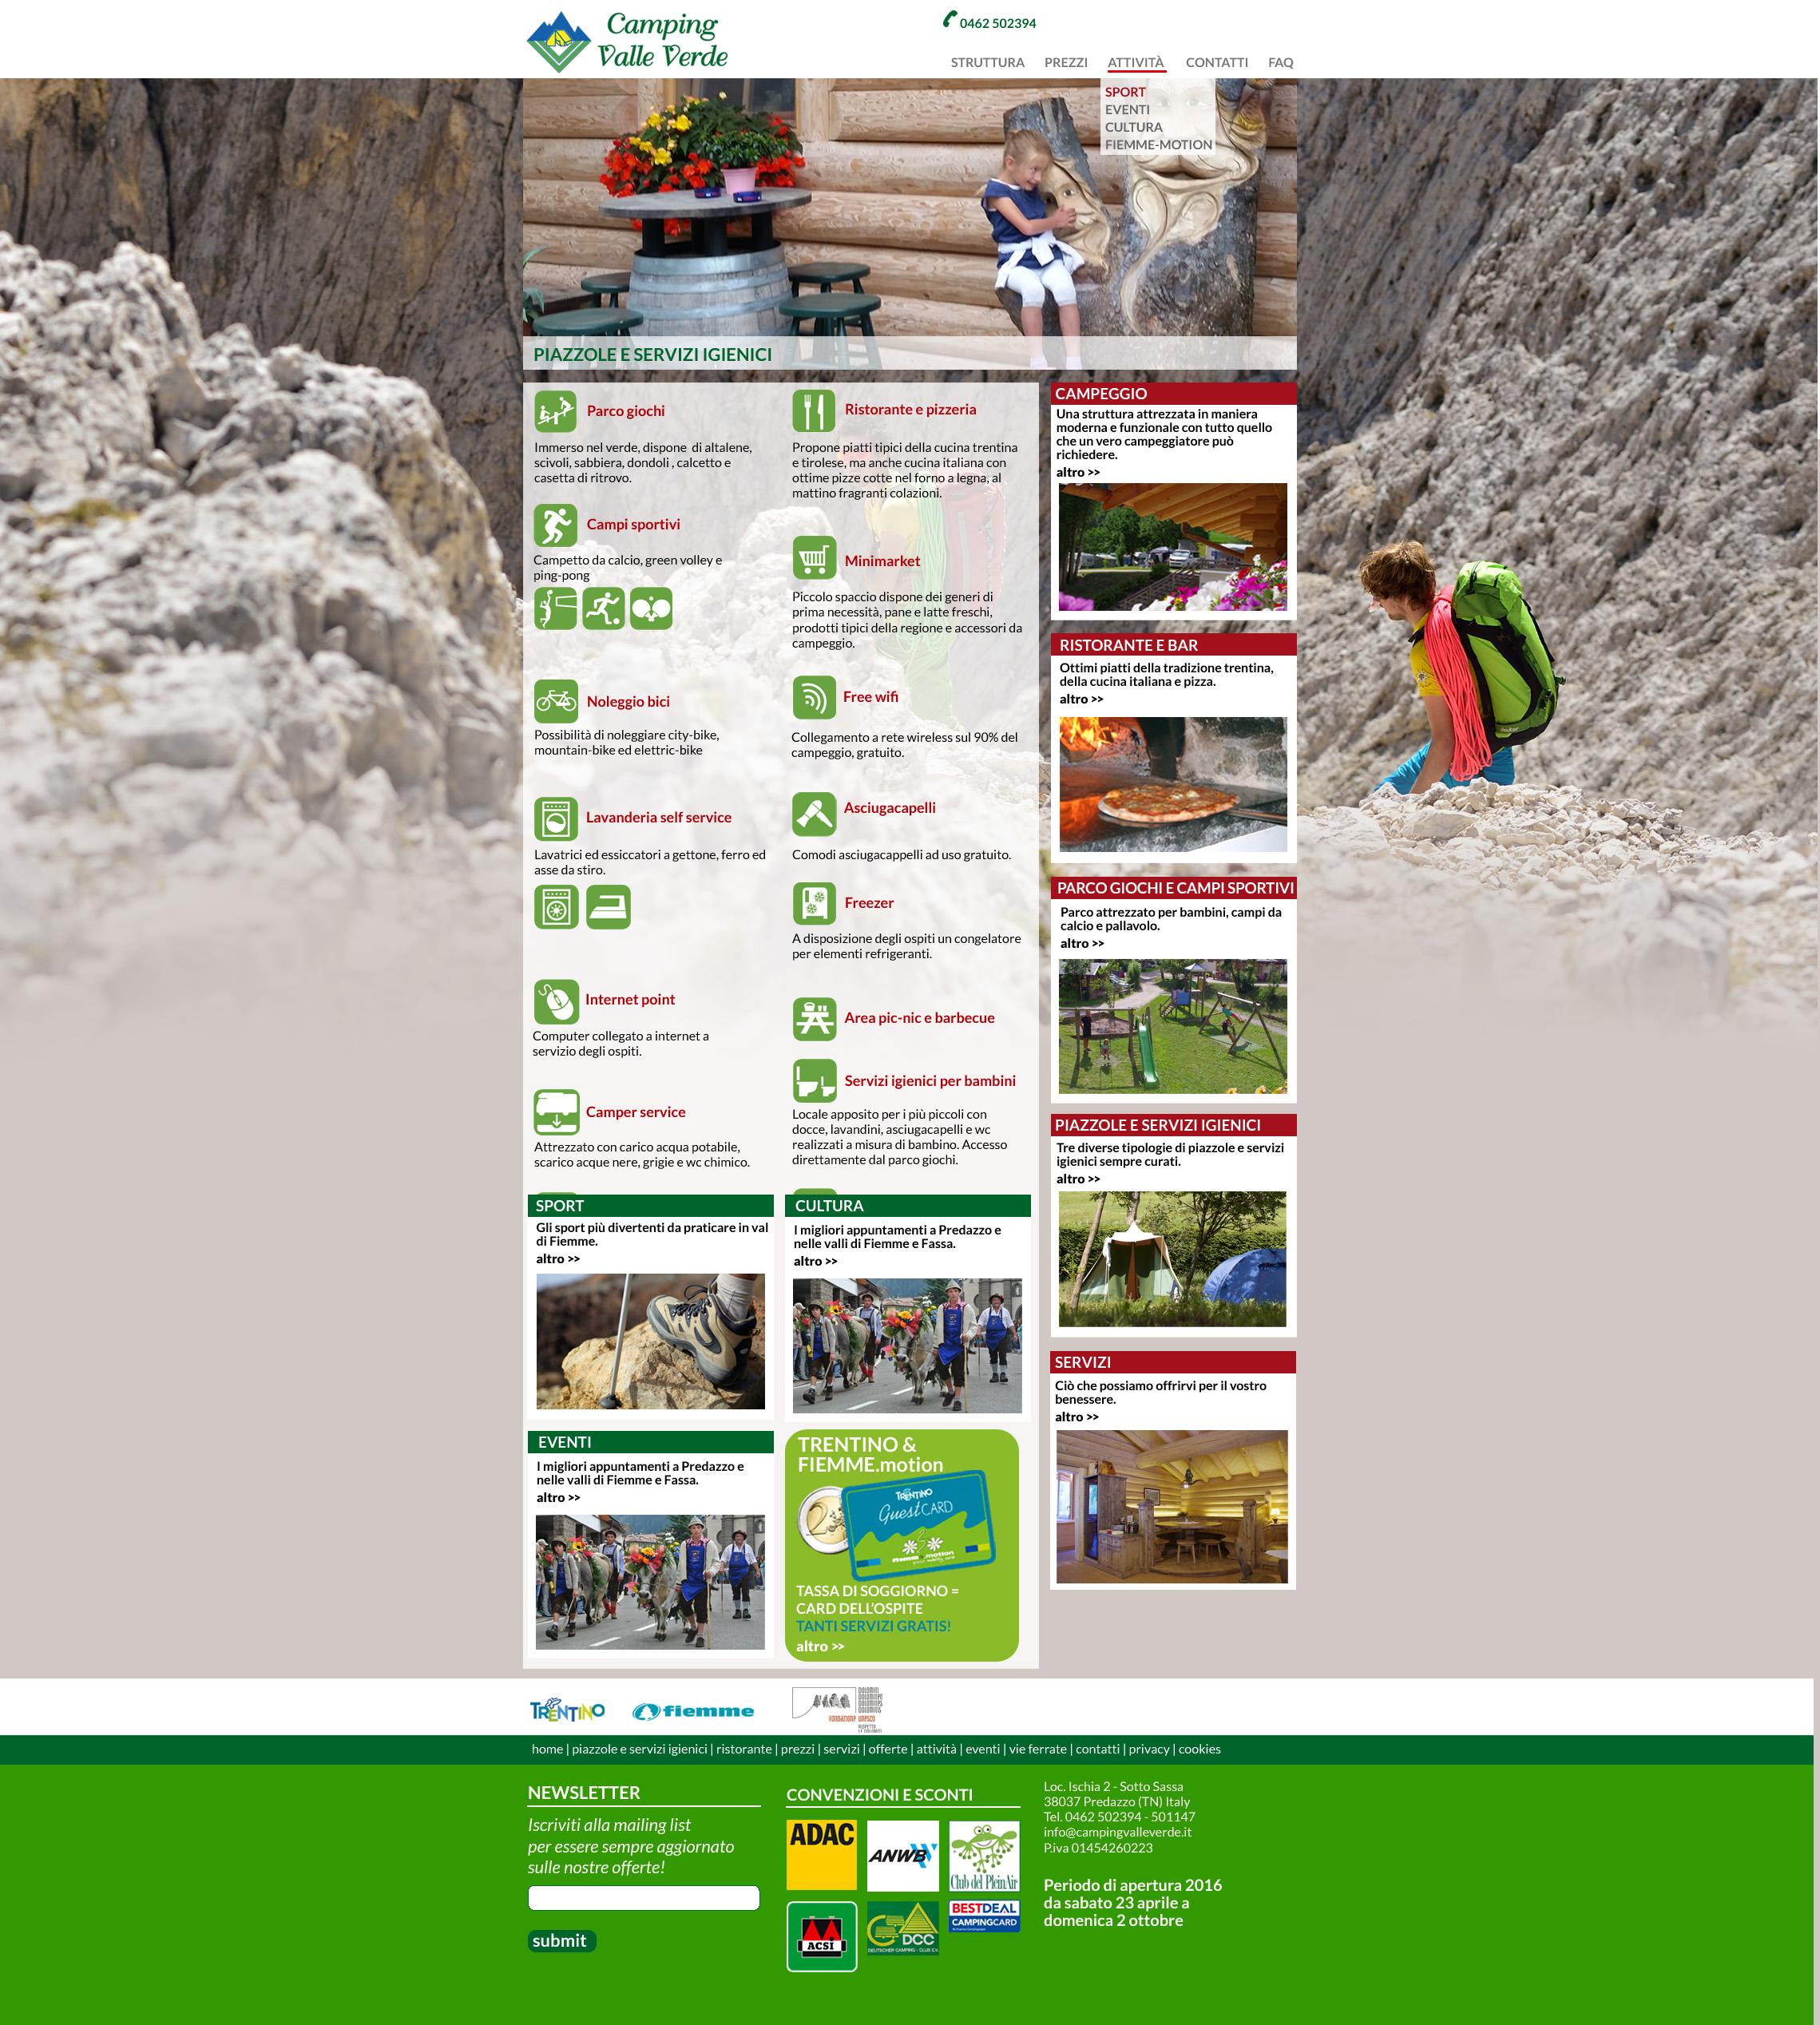 camping_valleverde_servizi